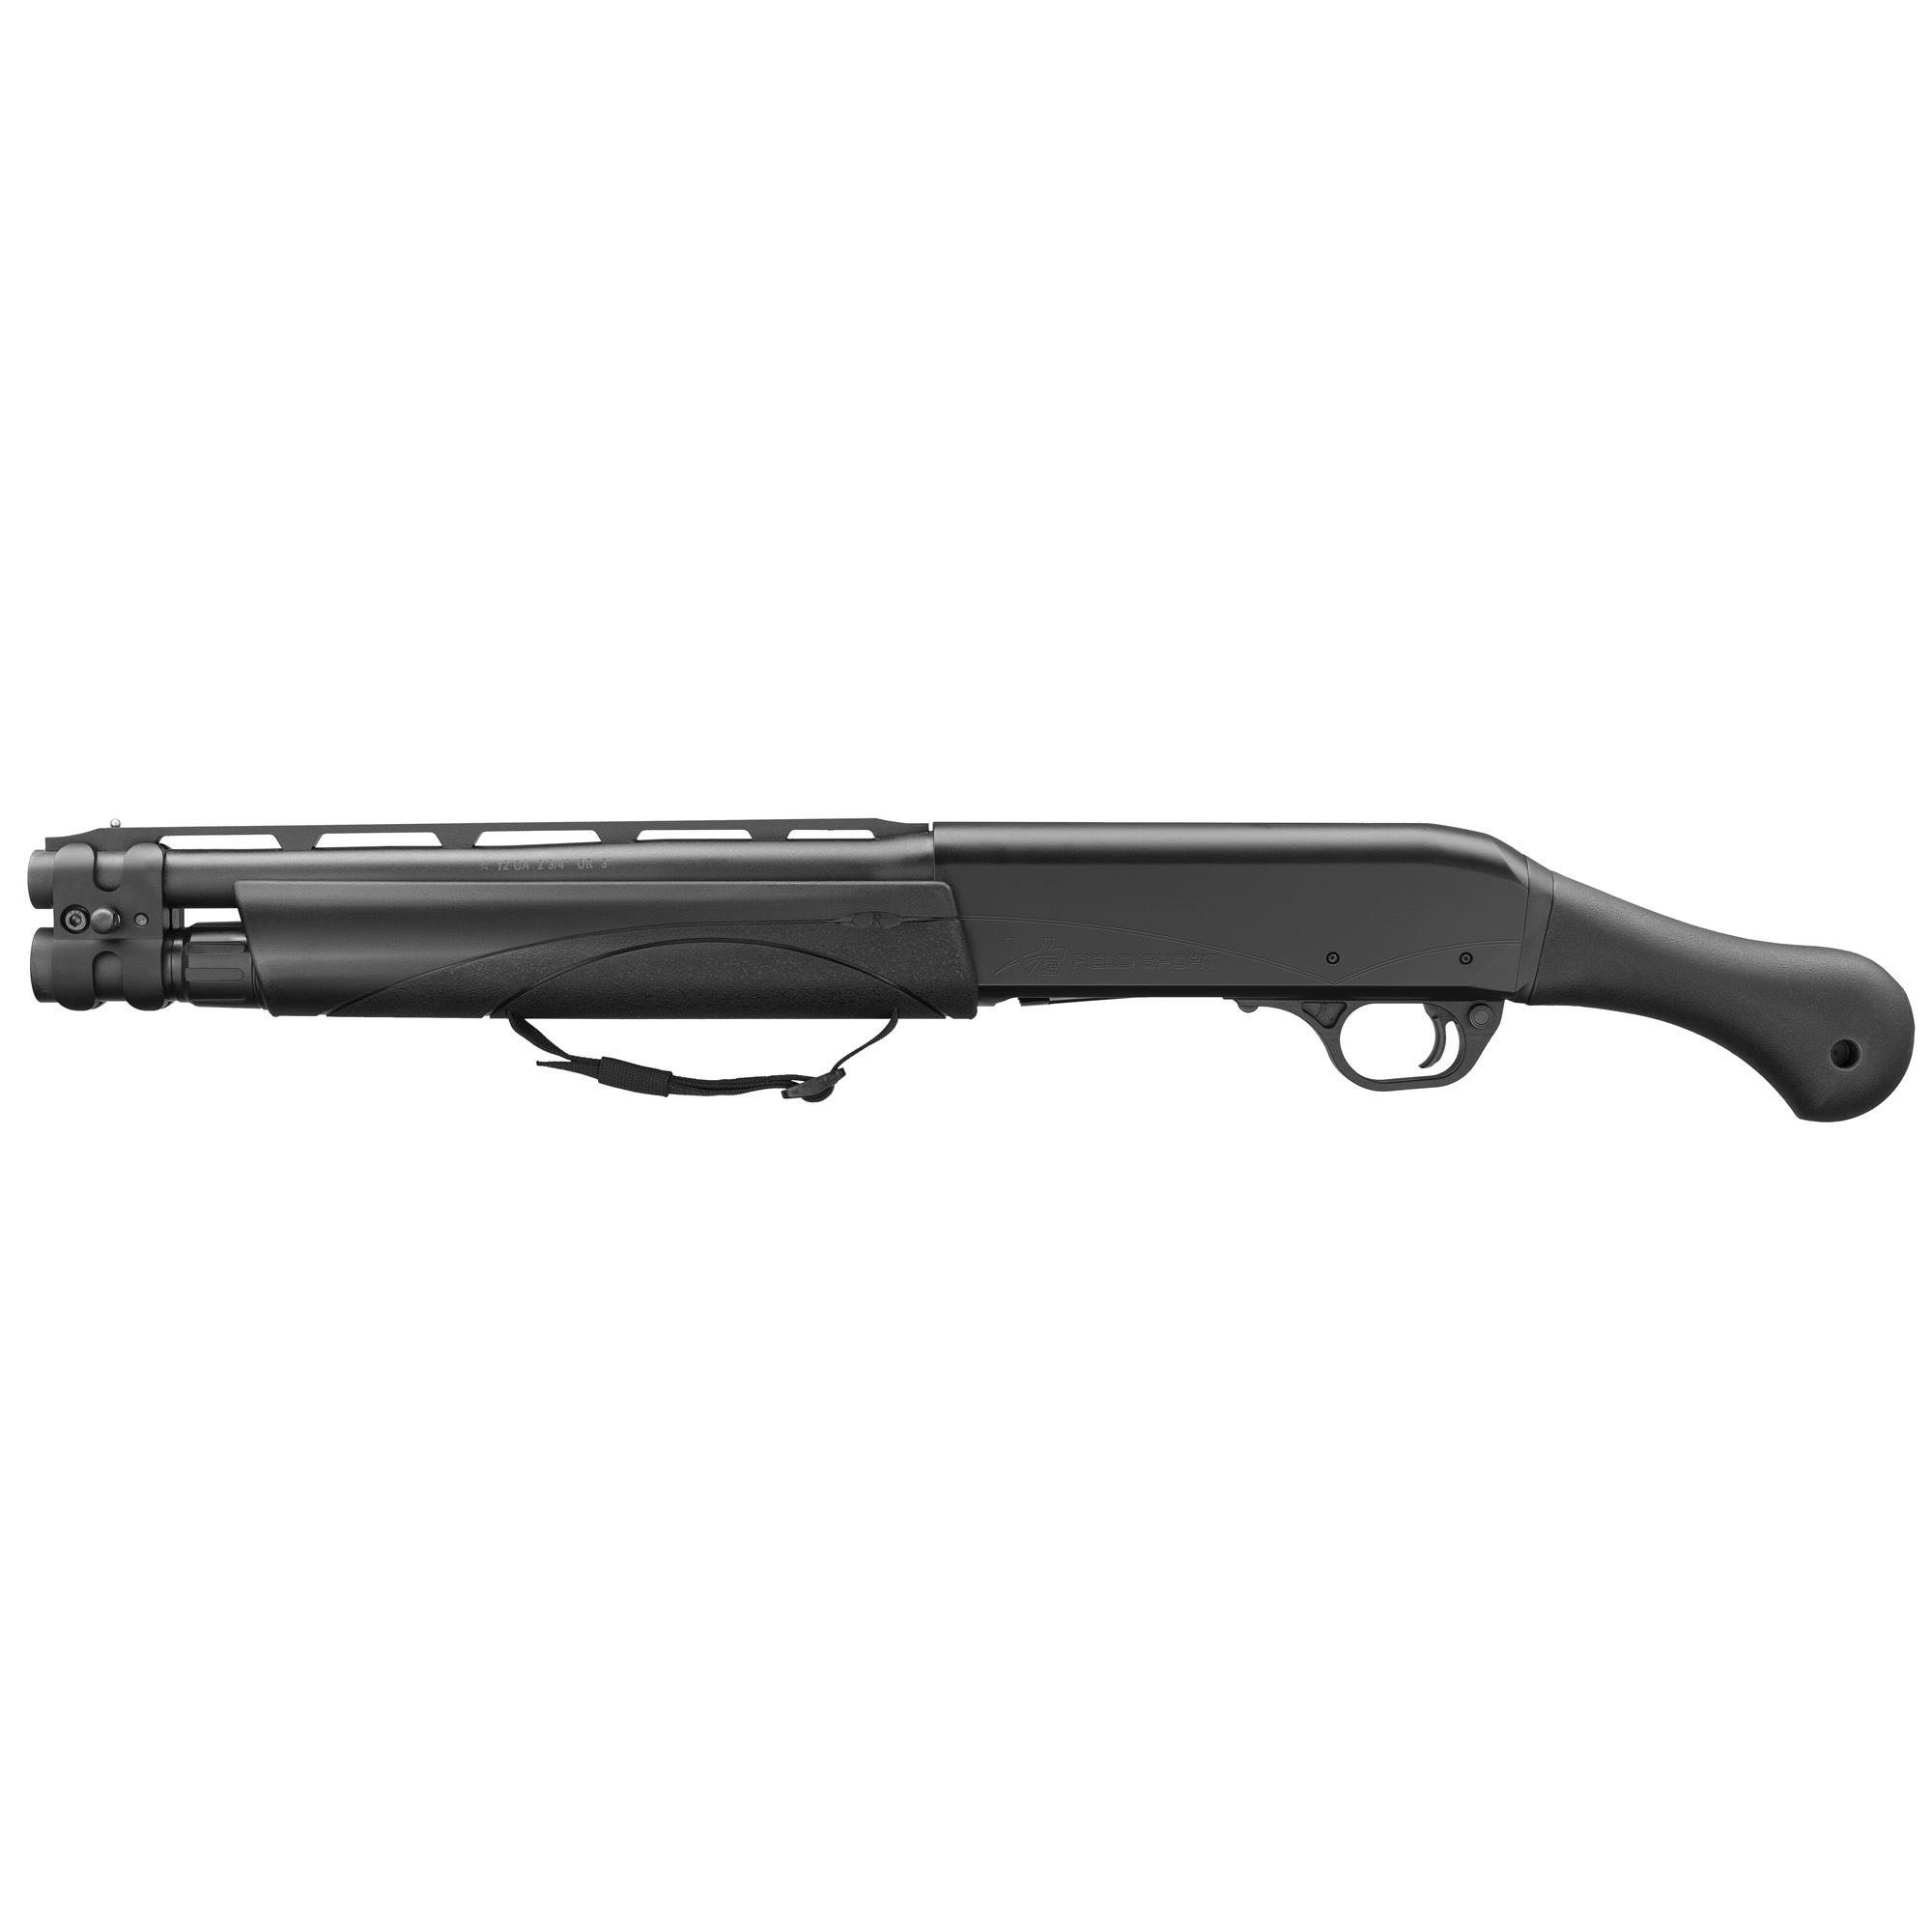 Remington V3 TAC-13 12ga Semi Auto · DK Firearms